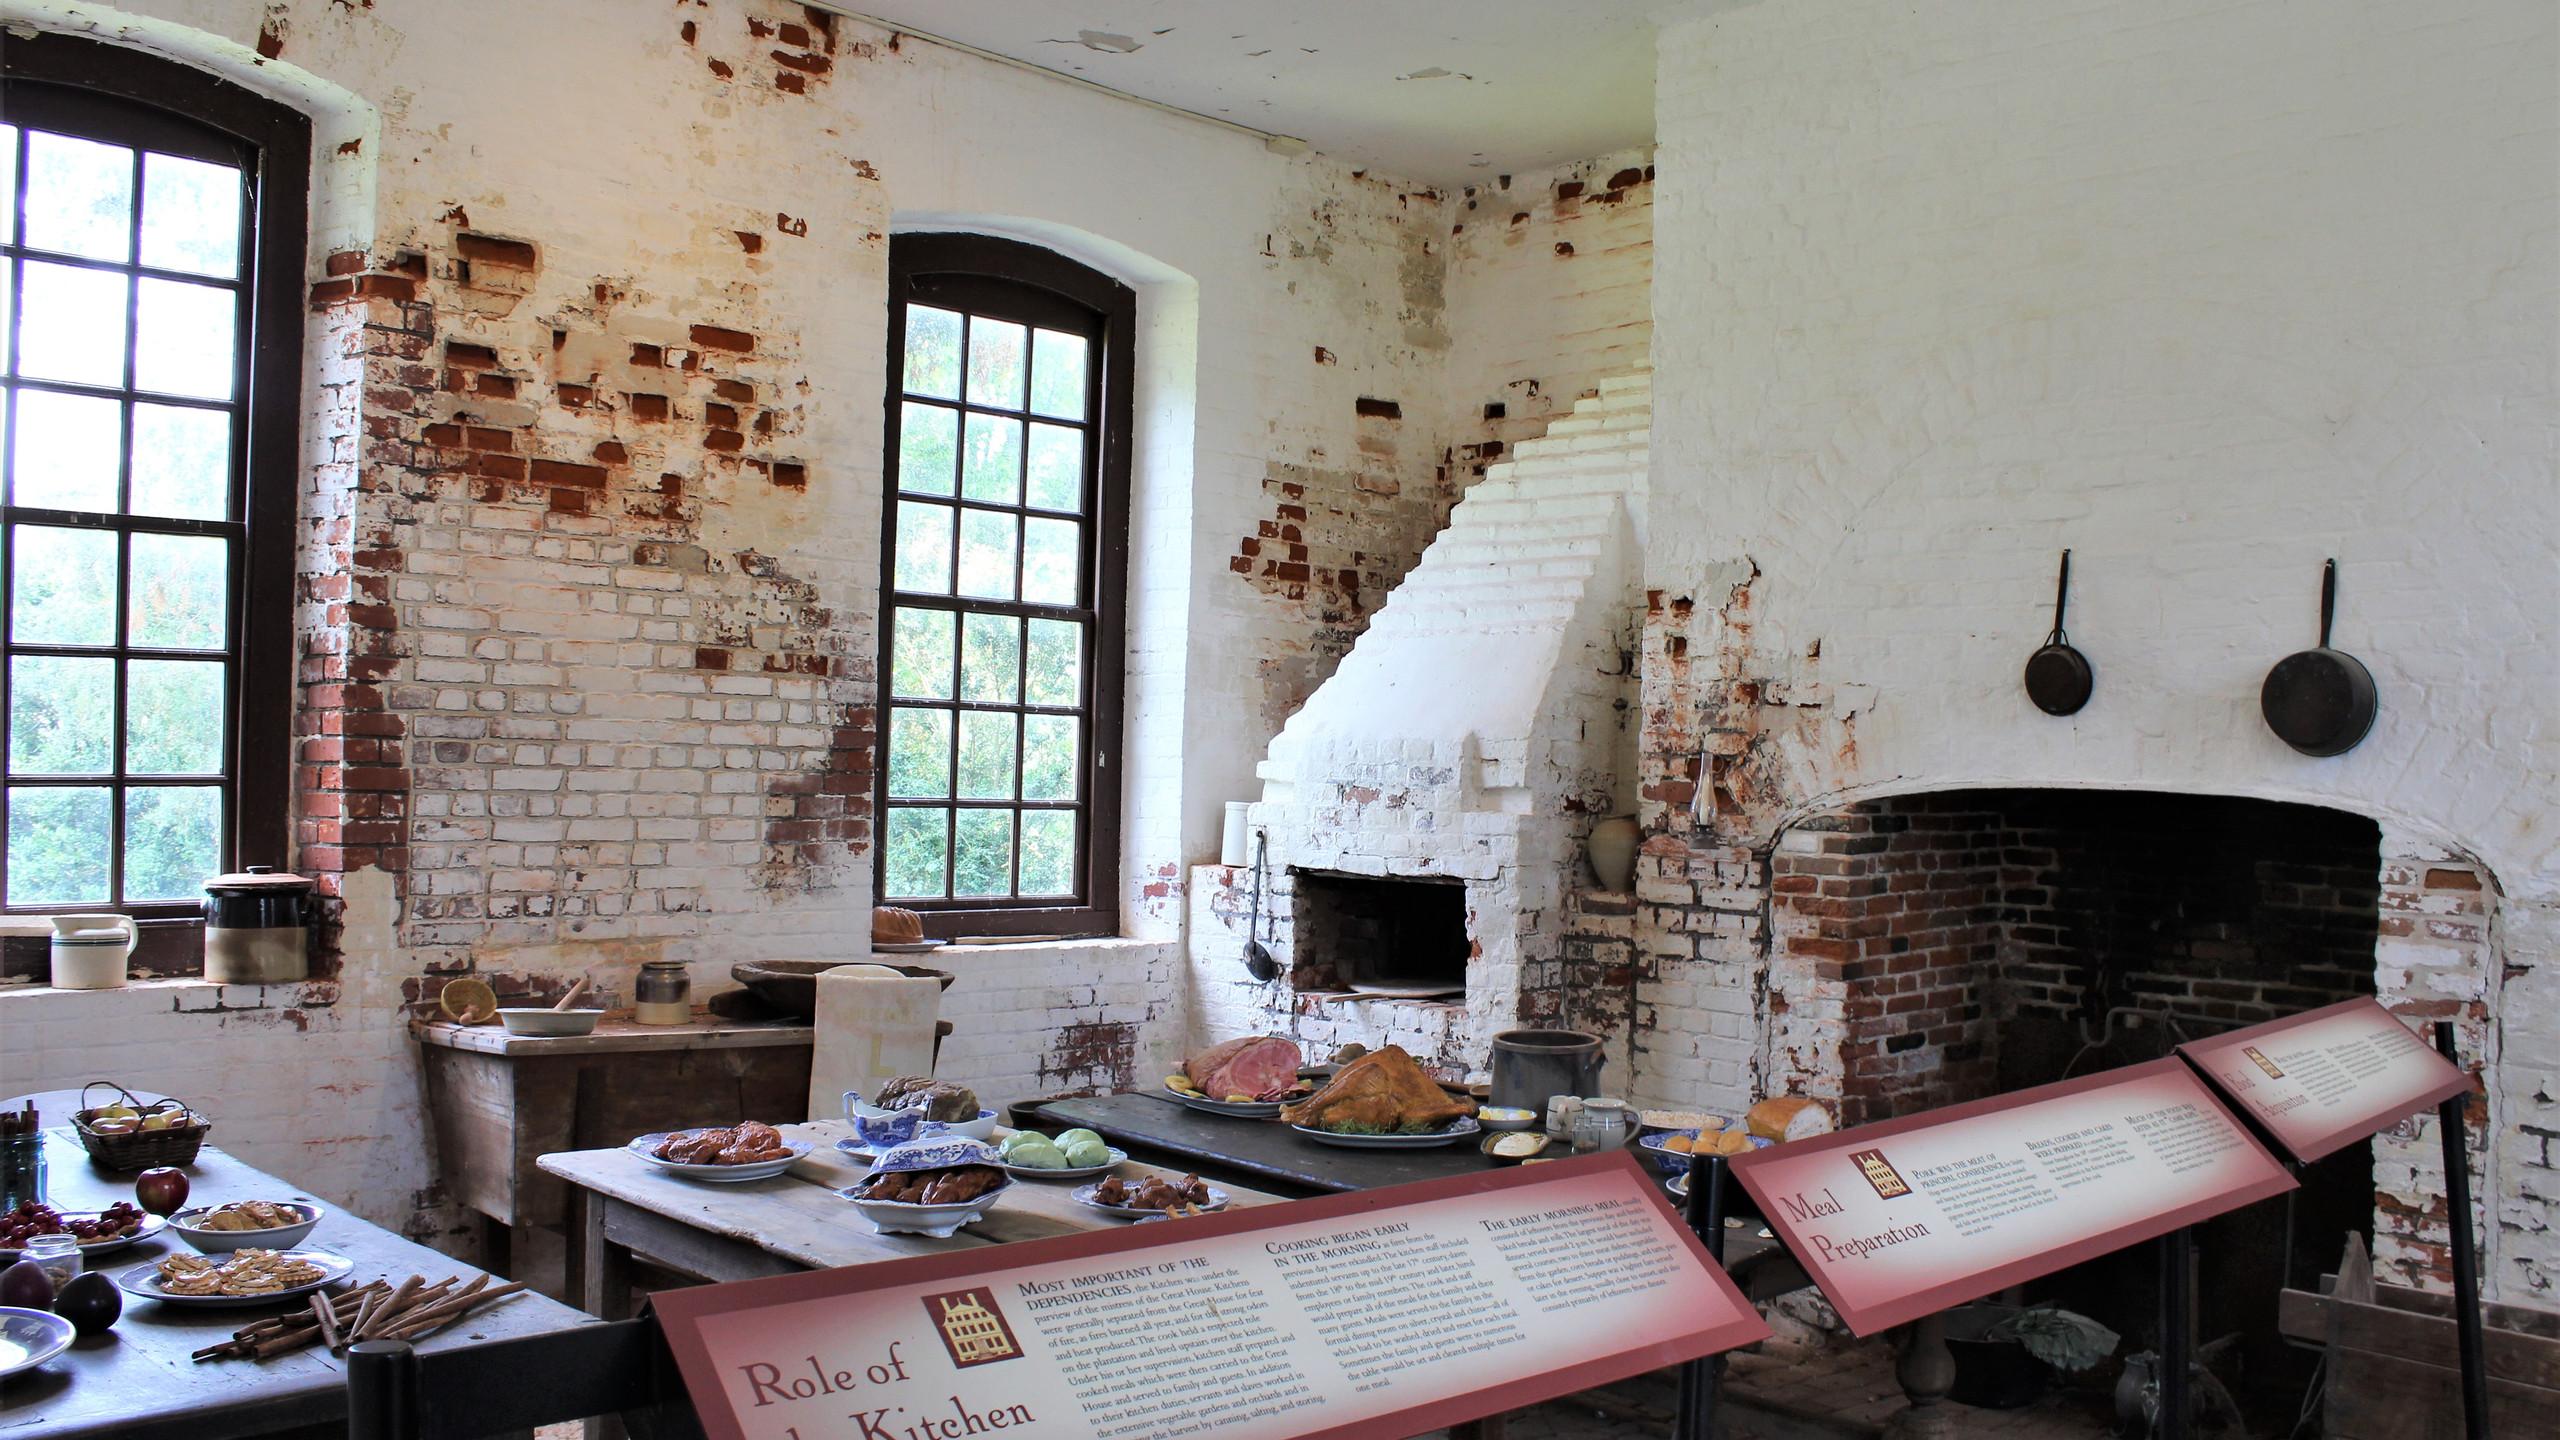 The Kitchen's Interior